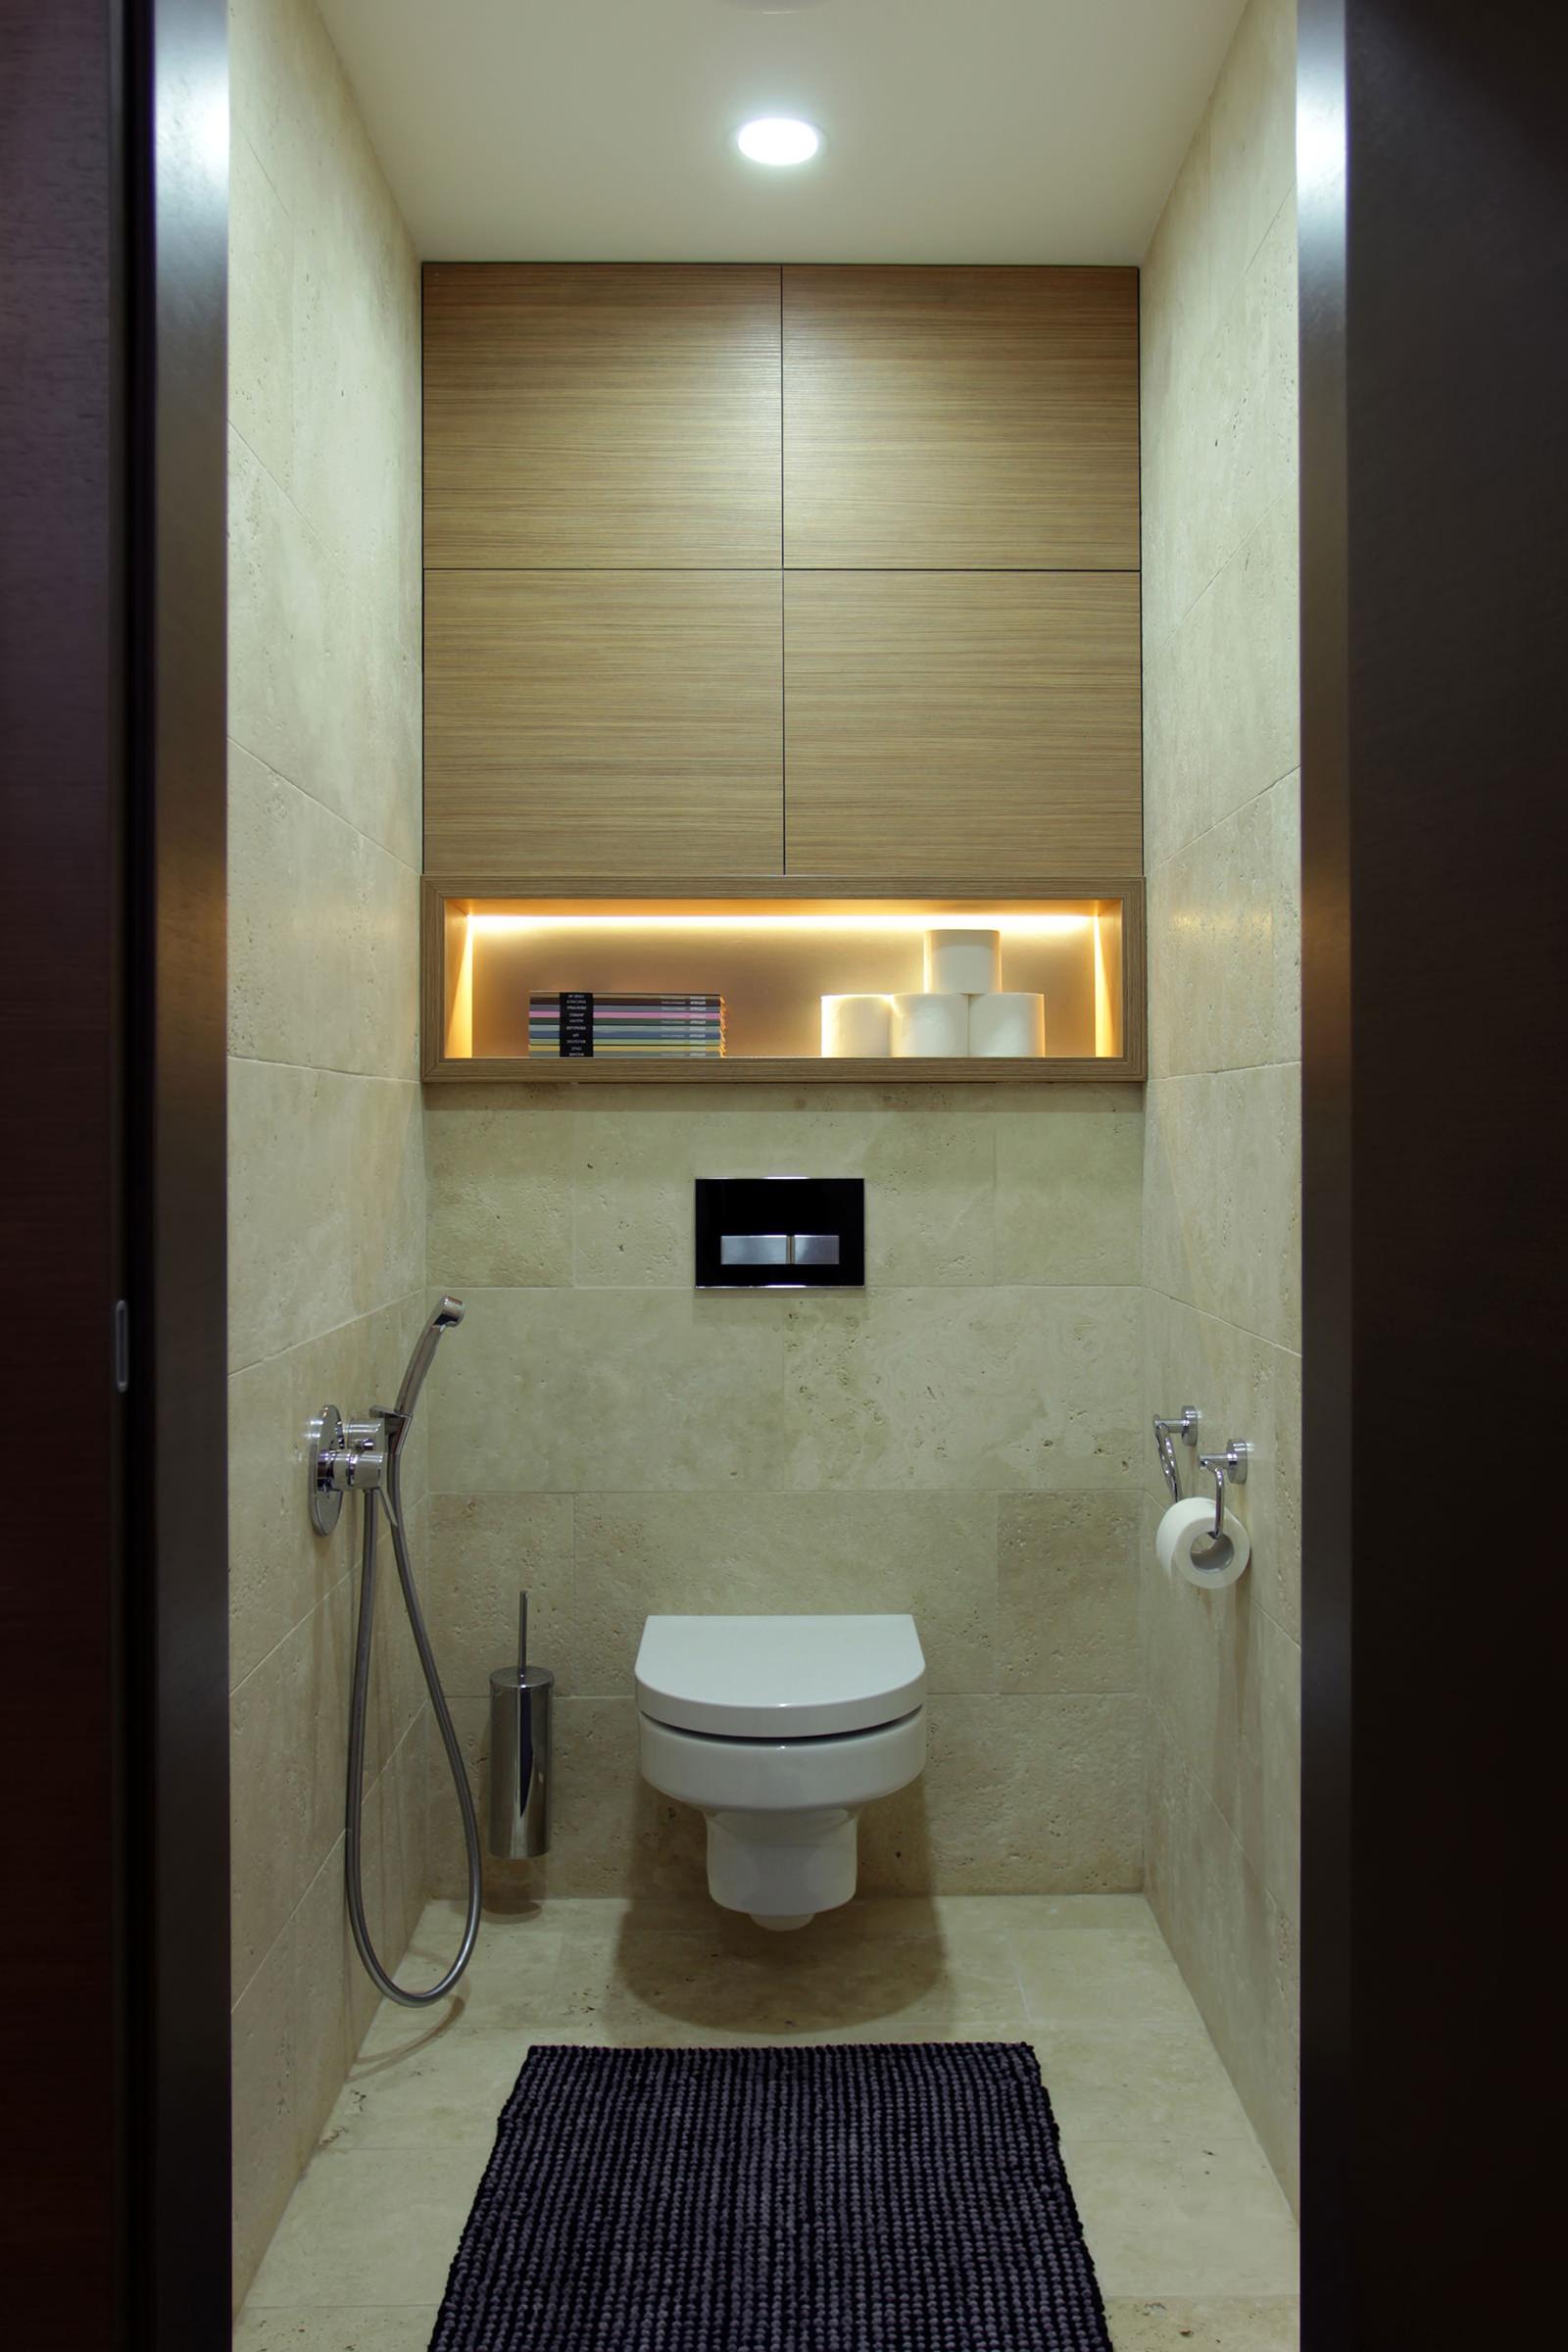 Дизайн маленьких туалетных комнат фото